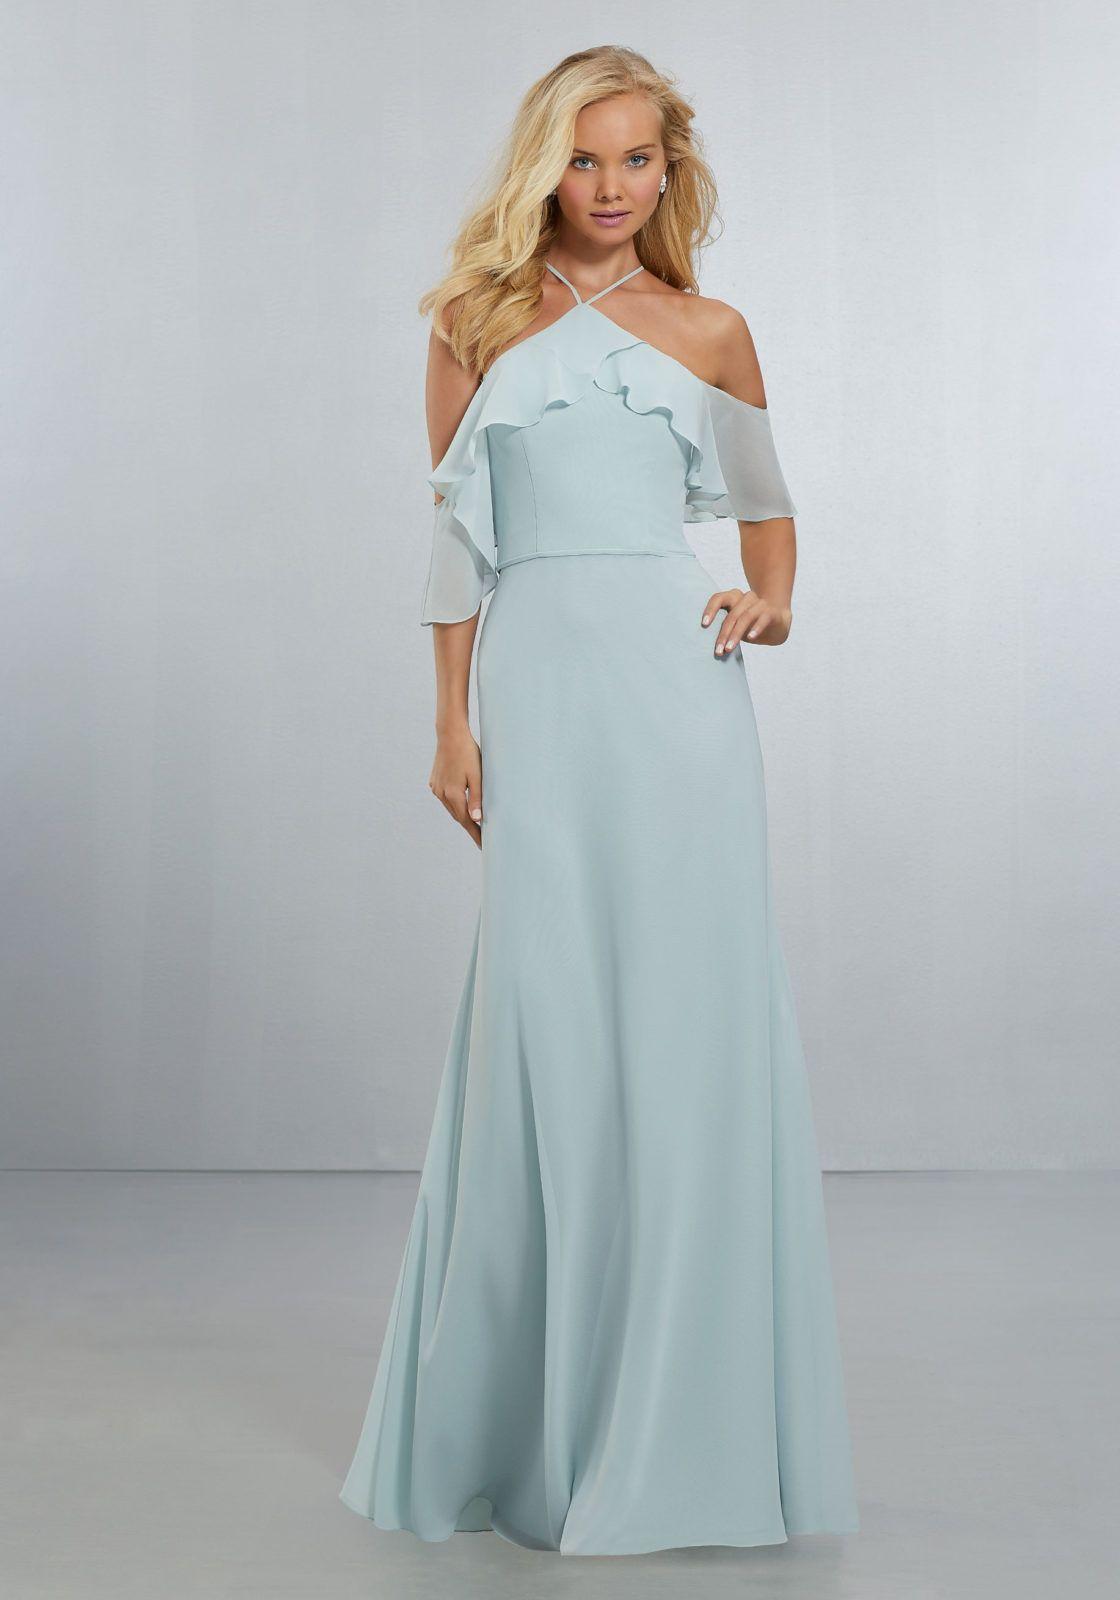 Pin by Maggie Dox on Wedding Style | Pinterest | Chiffon bridesmaid ...